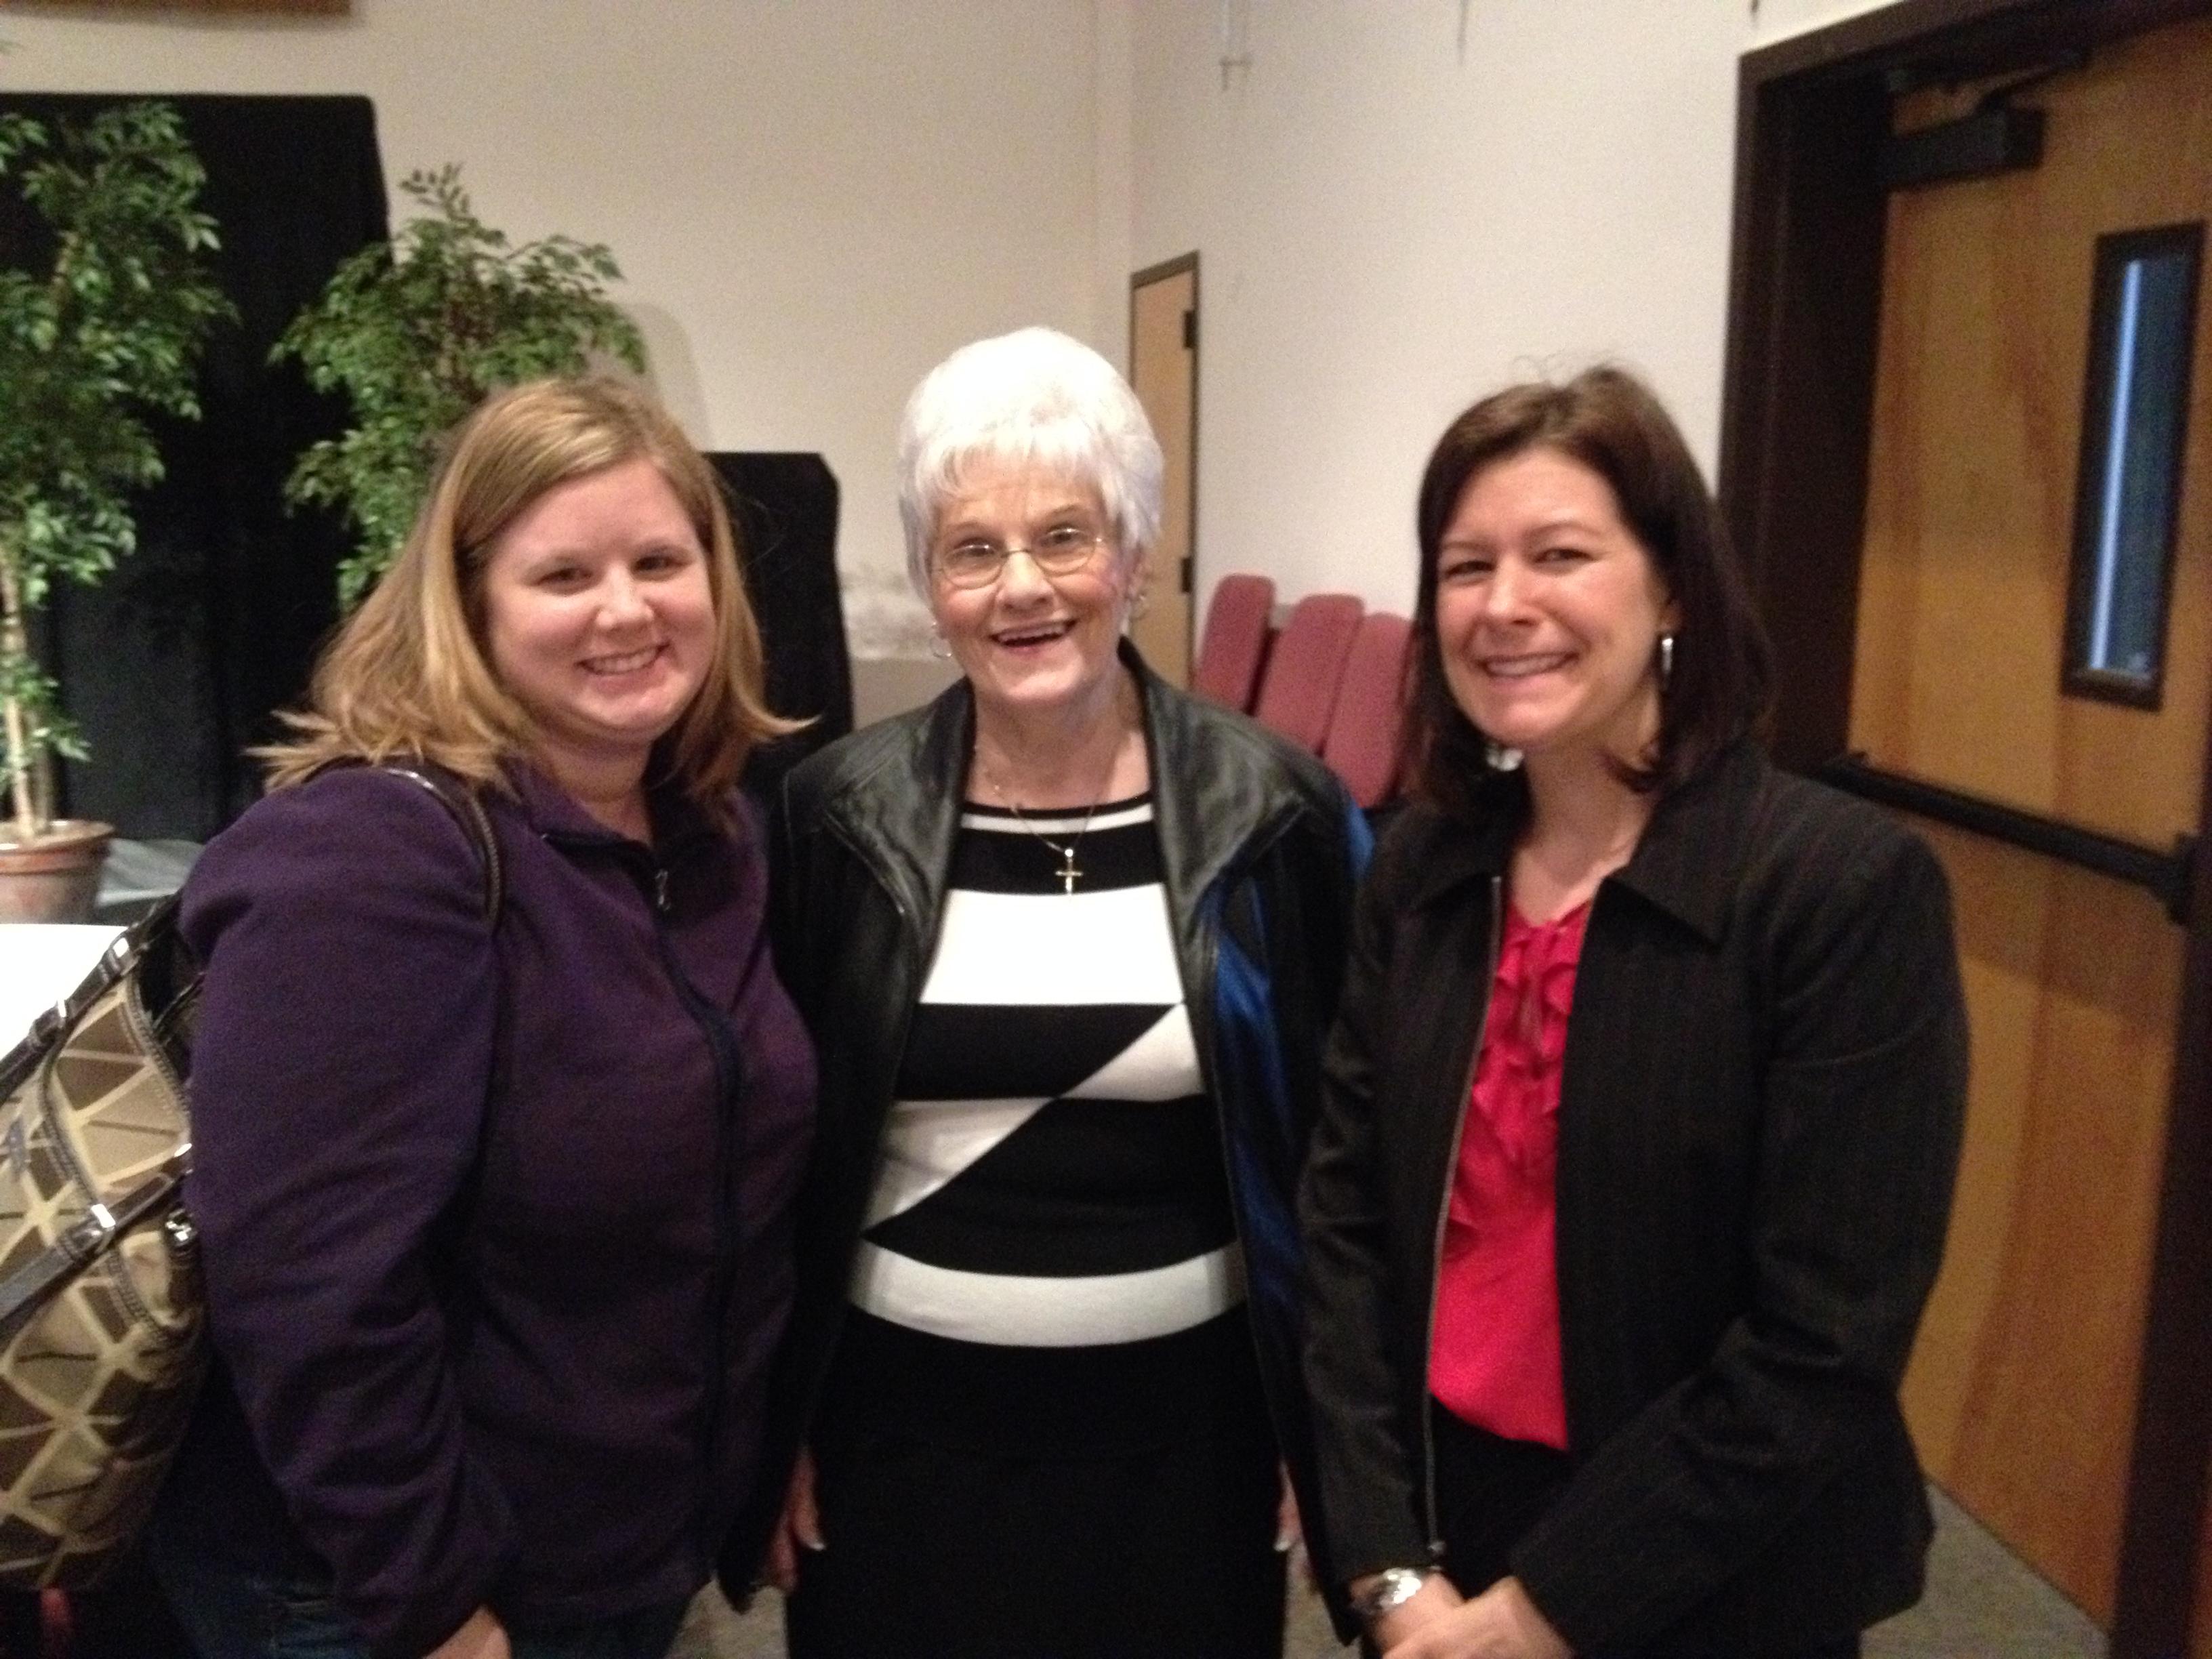 Rev. Jennifer's Reception - Miki, Evelyn, Brandy.JPG